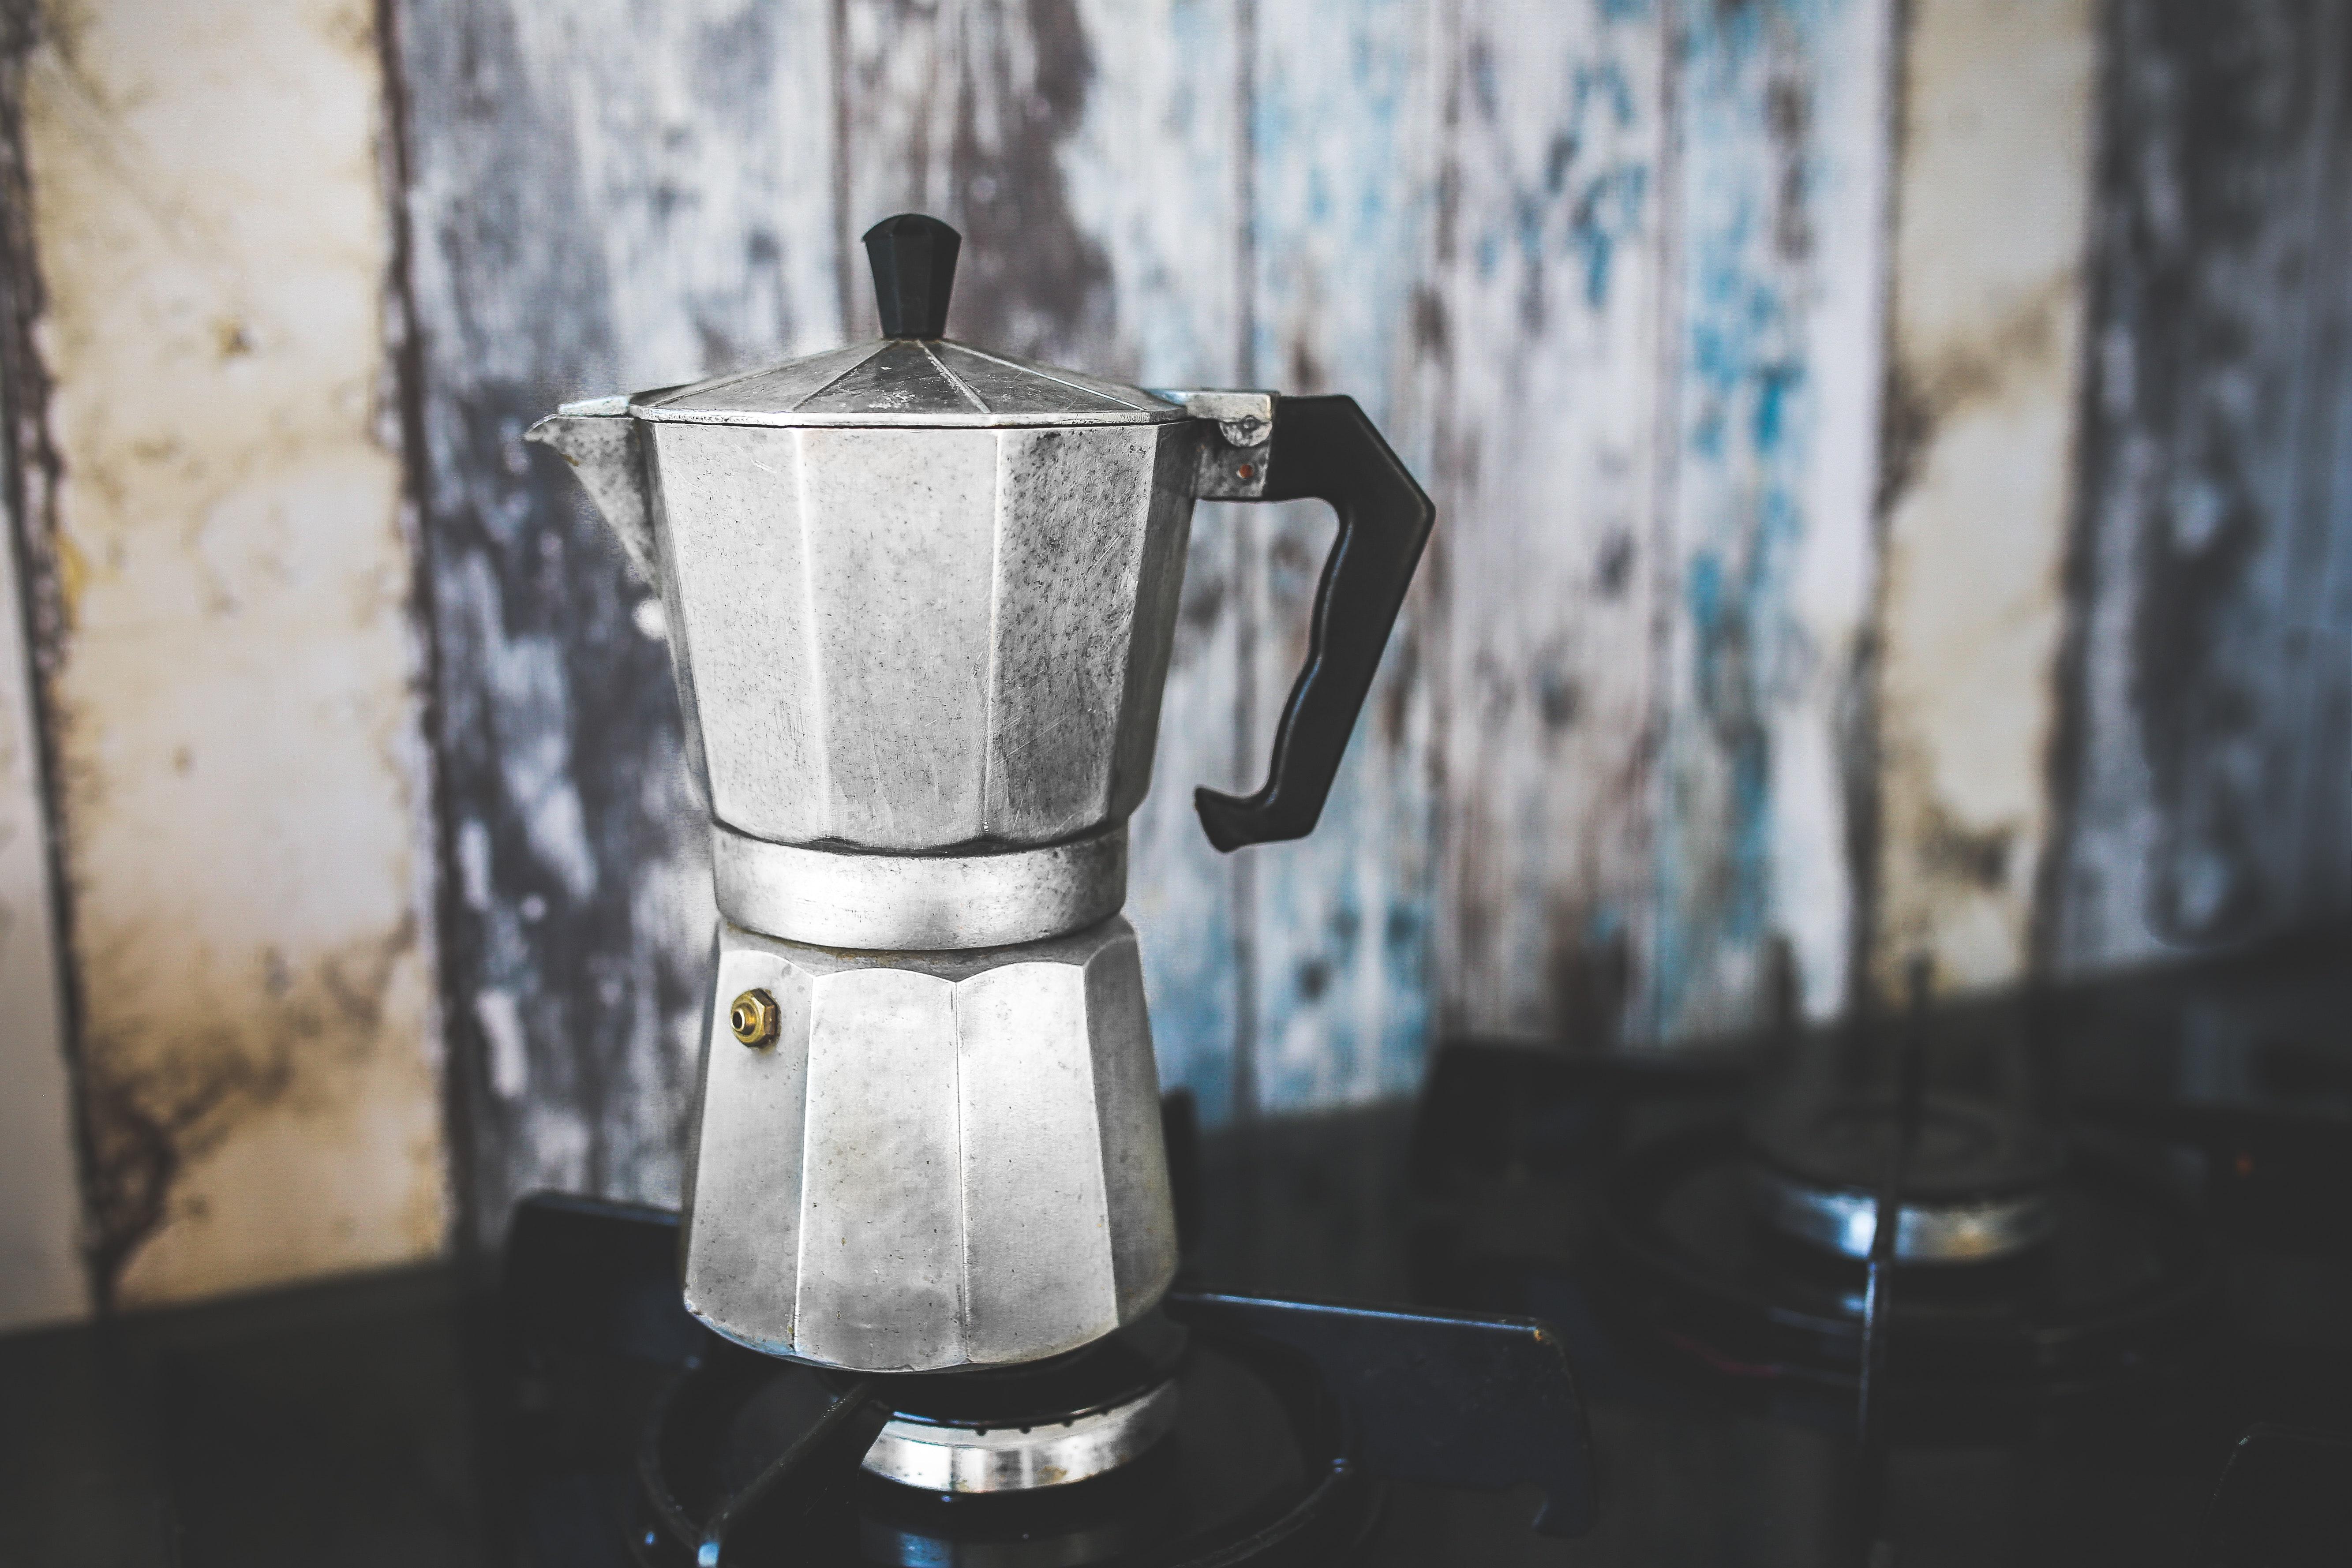 Vintage Moka Espresso Coffee Pot / Maker, Aluminium, Maker, Vintage, Tea, HQ Photo